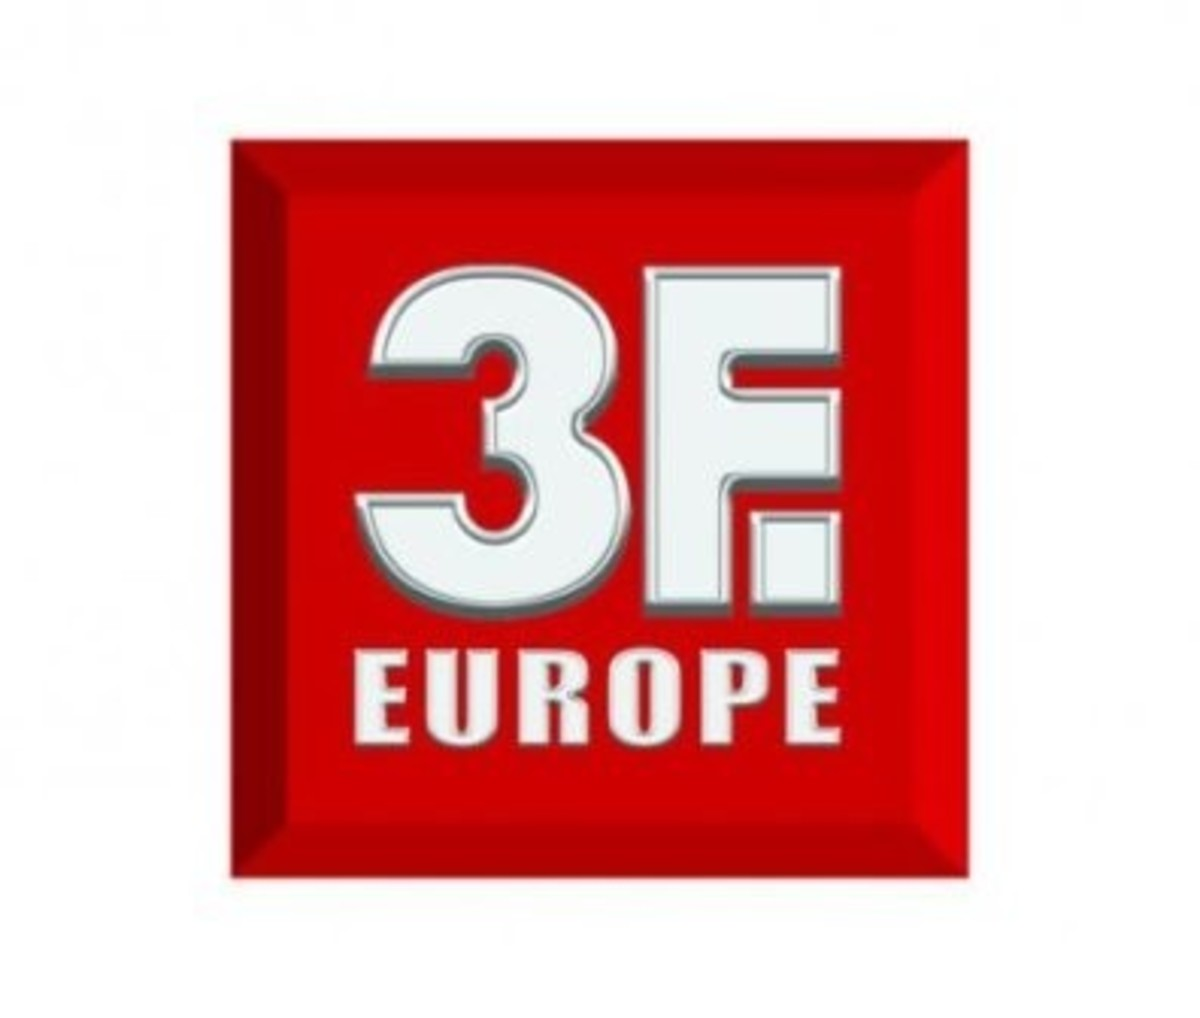 Bild 3 von 3F Lederetui (Rindleder) 4-tlg. mit Druckknopf orange